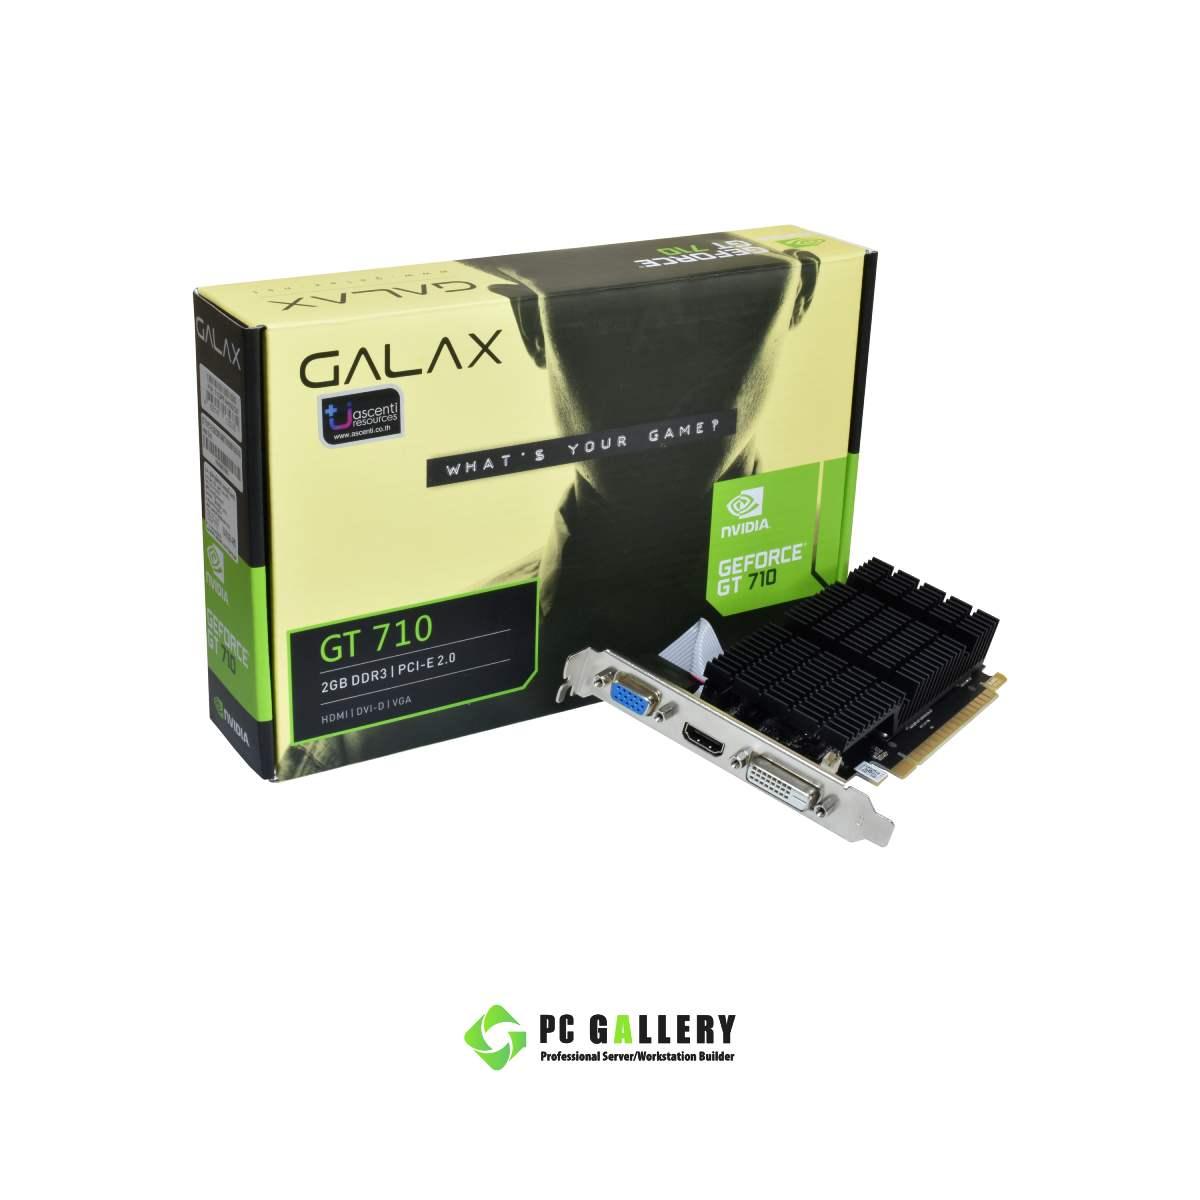 NVIDIA GALAX GT710-01